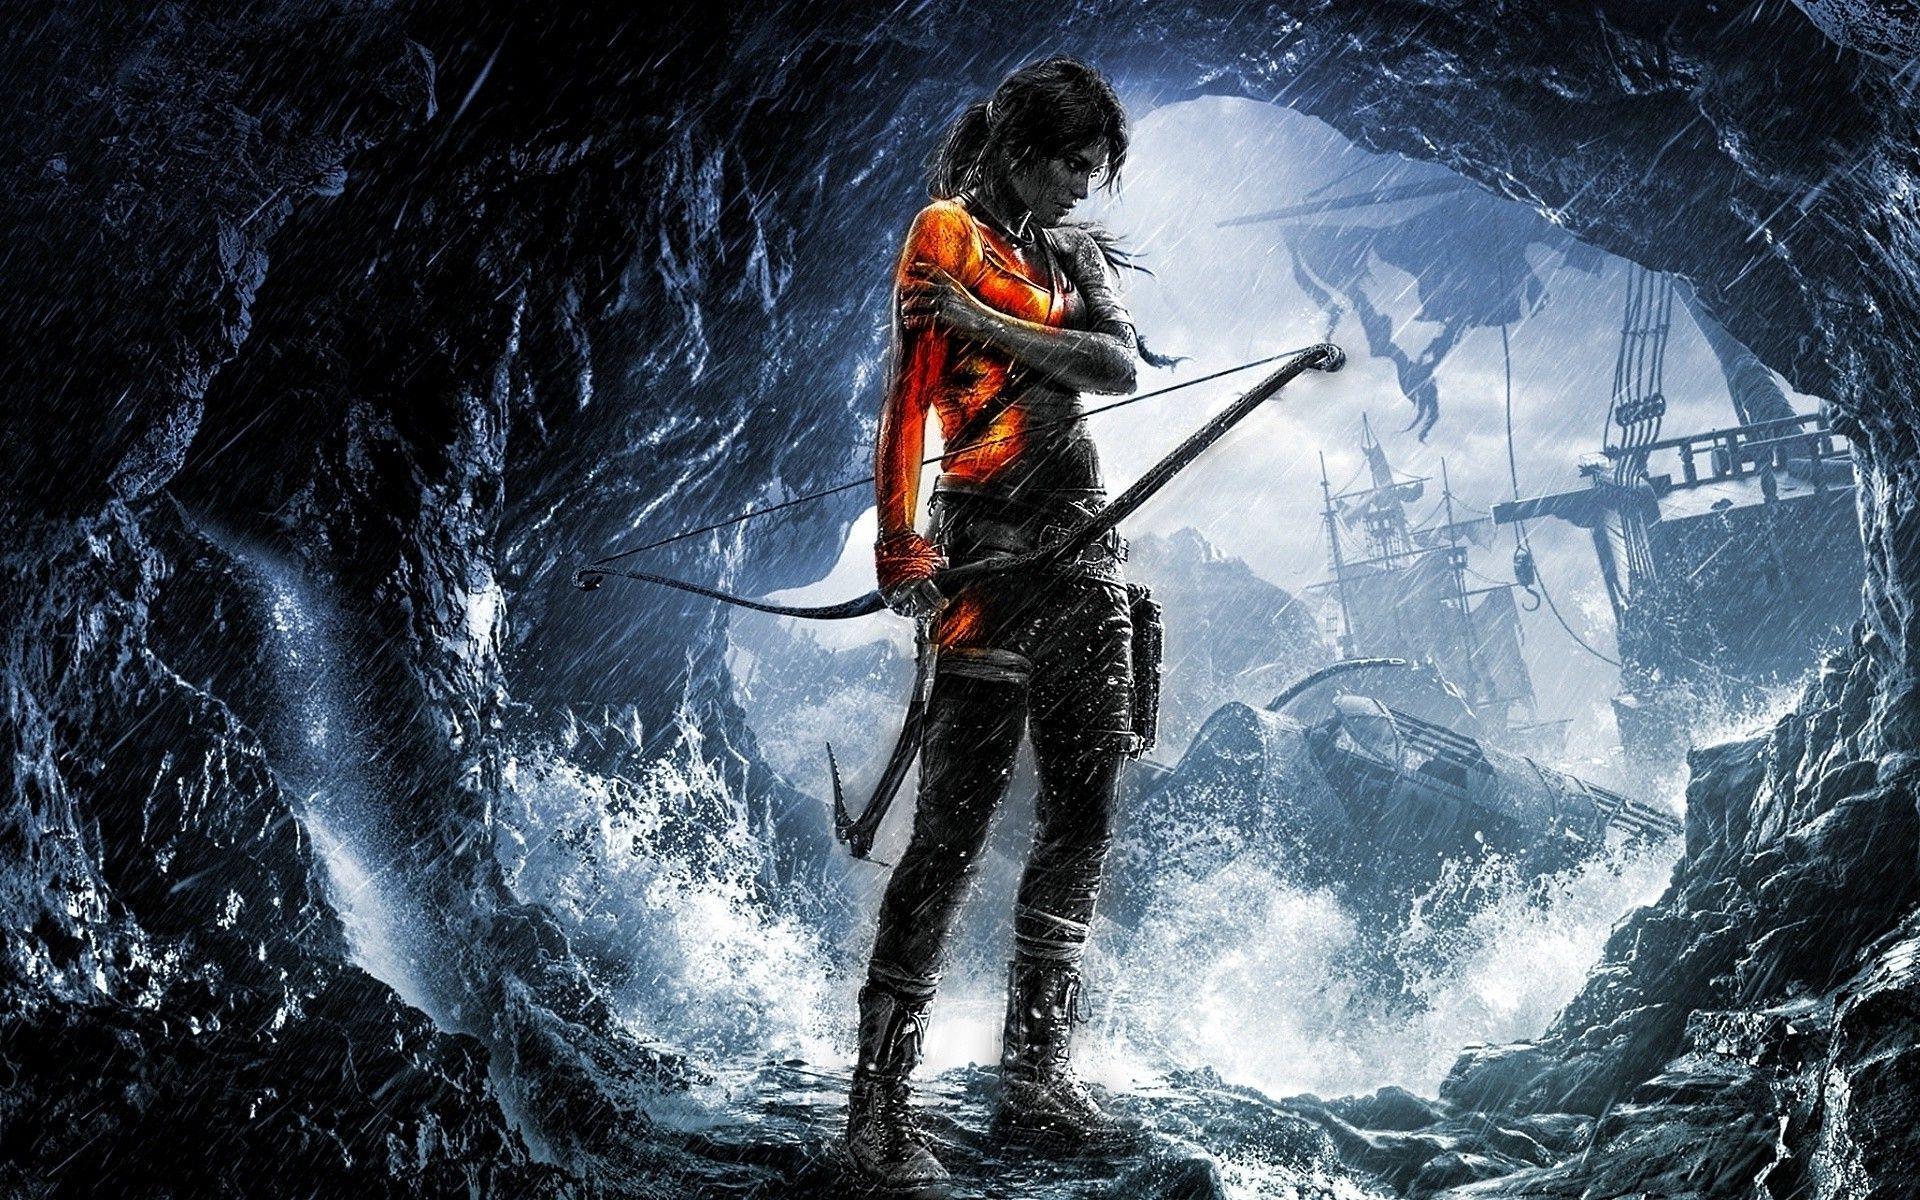 Lara Croft Rise Of The Tomb Raider Wallpapers Uloussavers